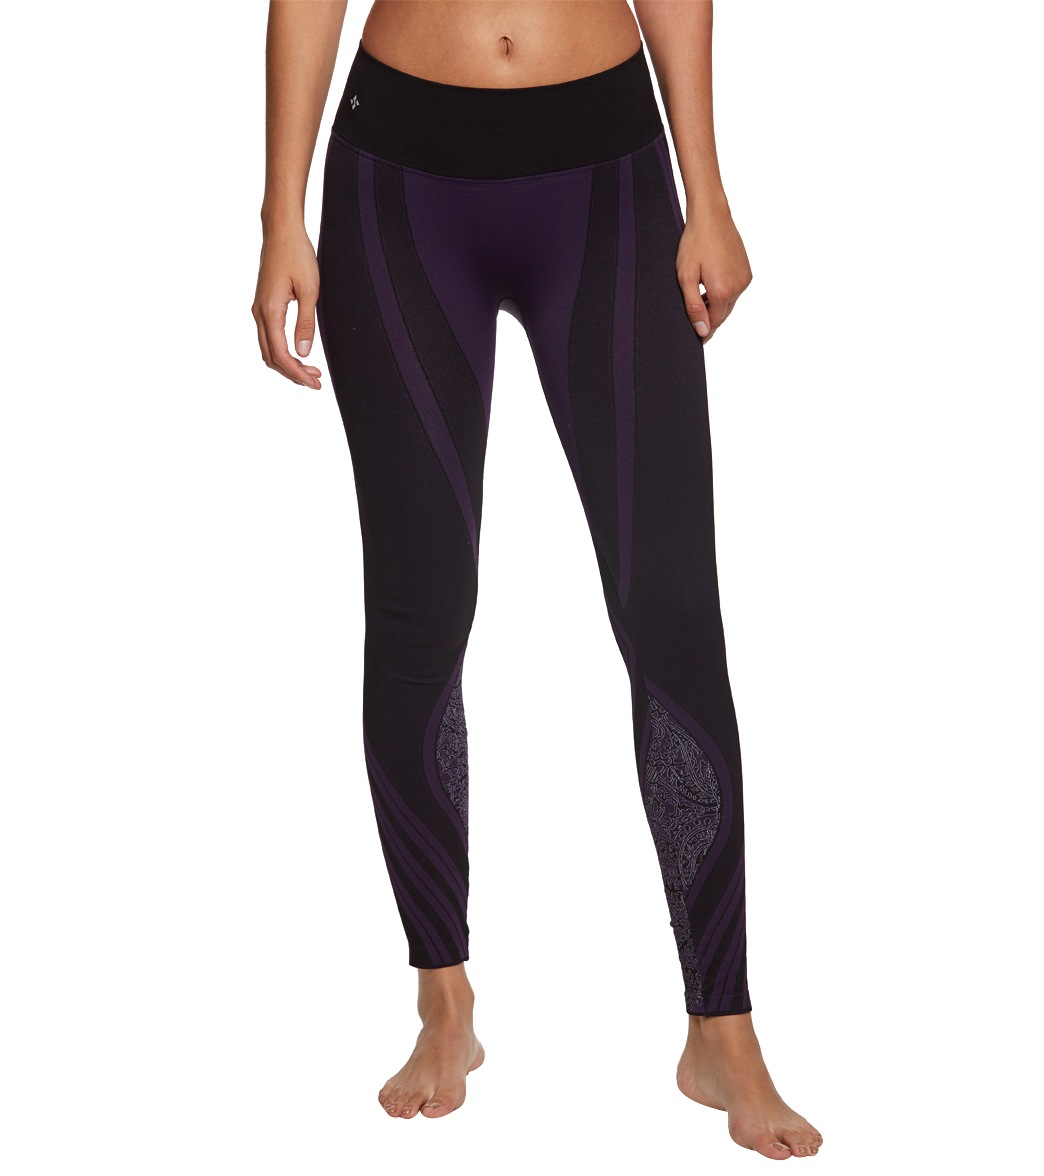 285ba5d4e8004 NUX Vera Seamless Yoga Leggings at YogaOutlet.com - Free Shipping